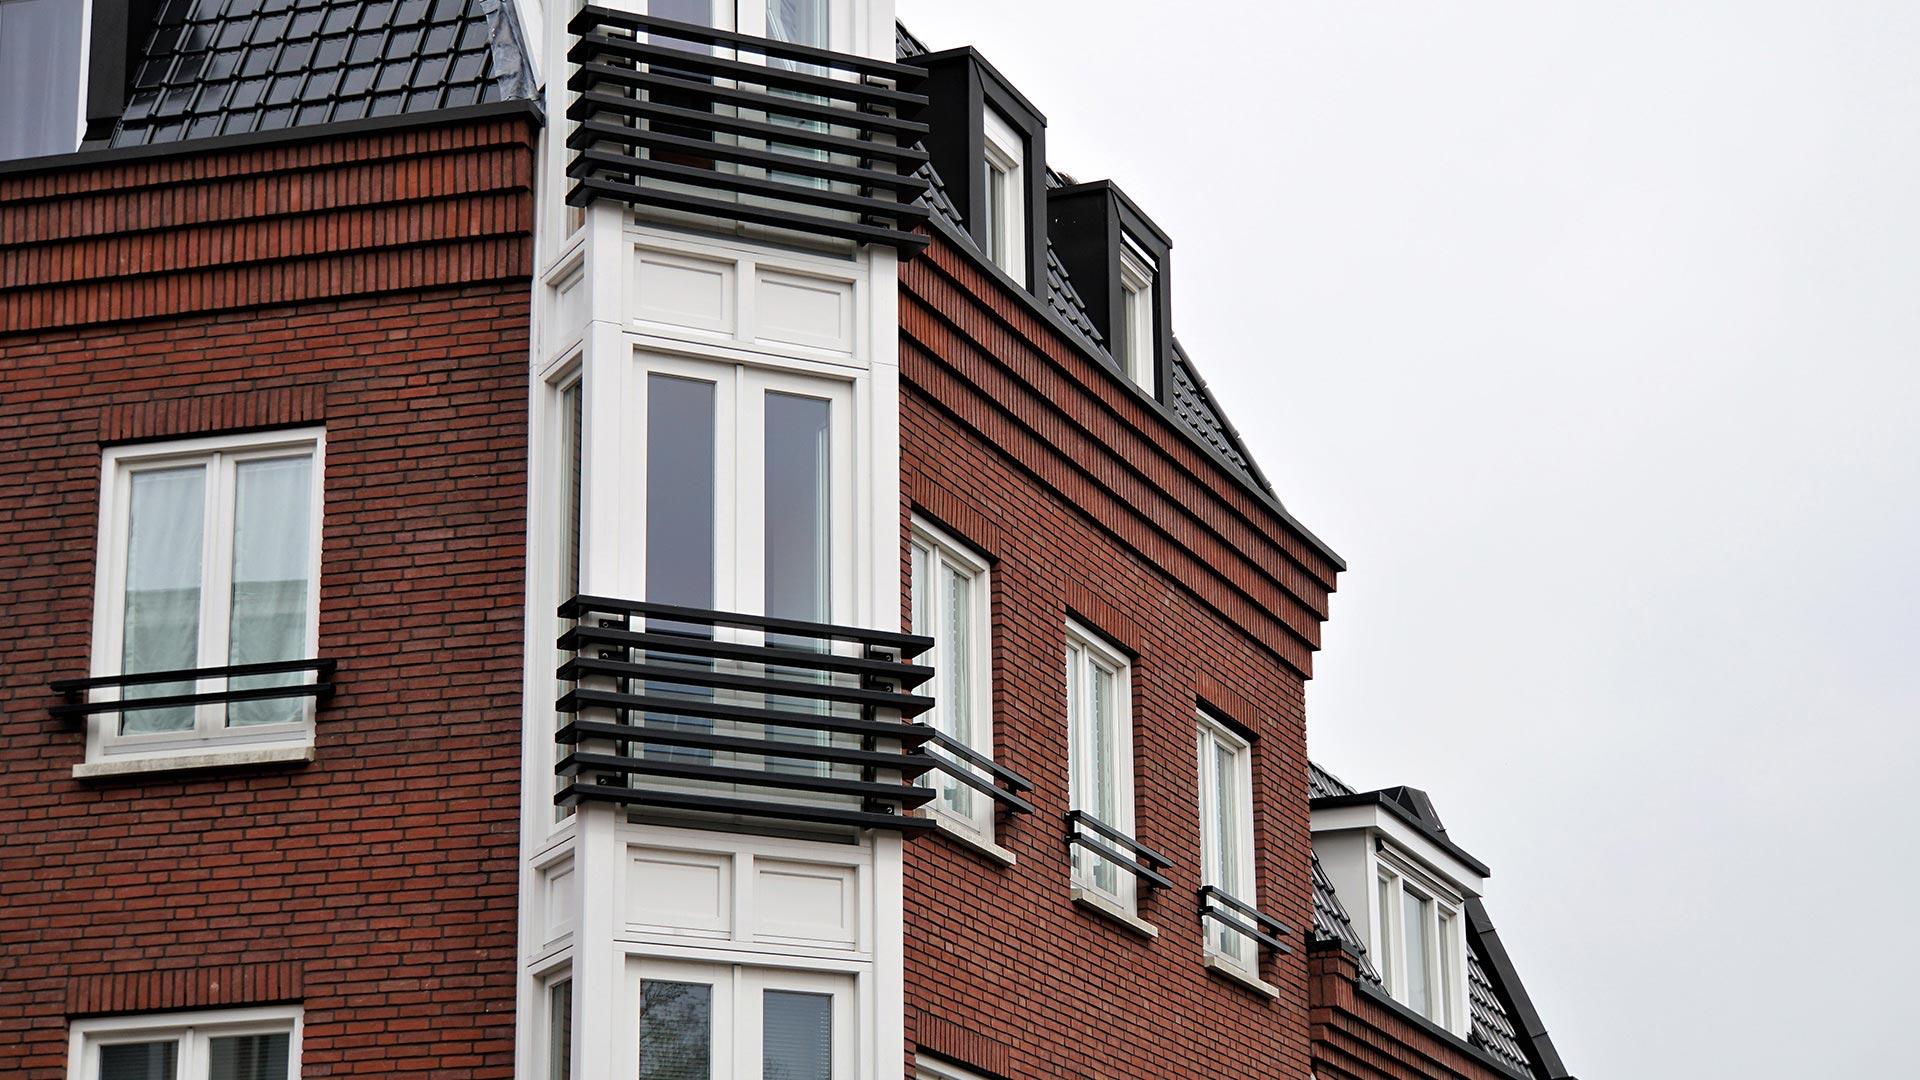 Bouwgroep Horsman & co project Schoterweg Haarlem